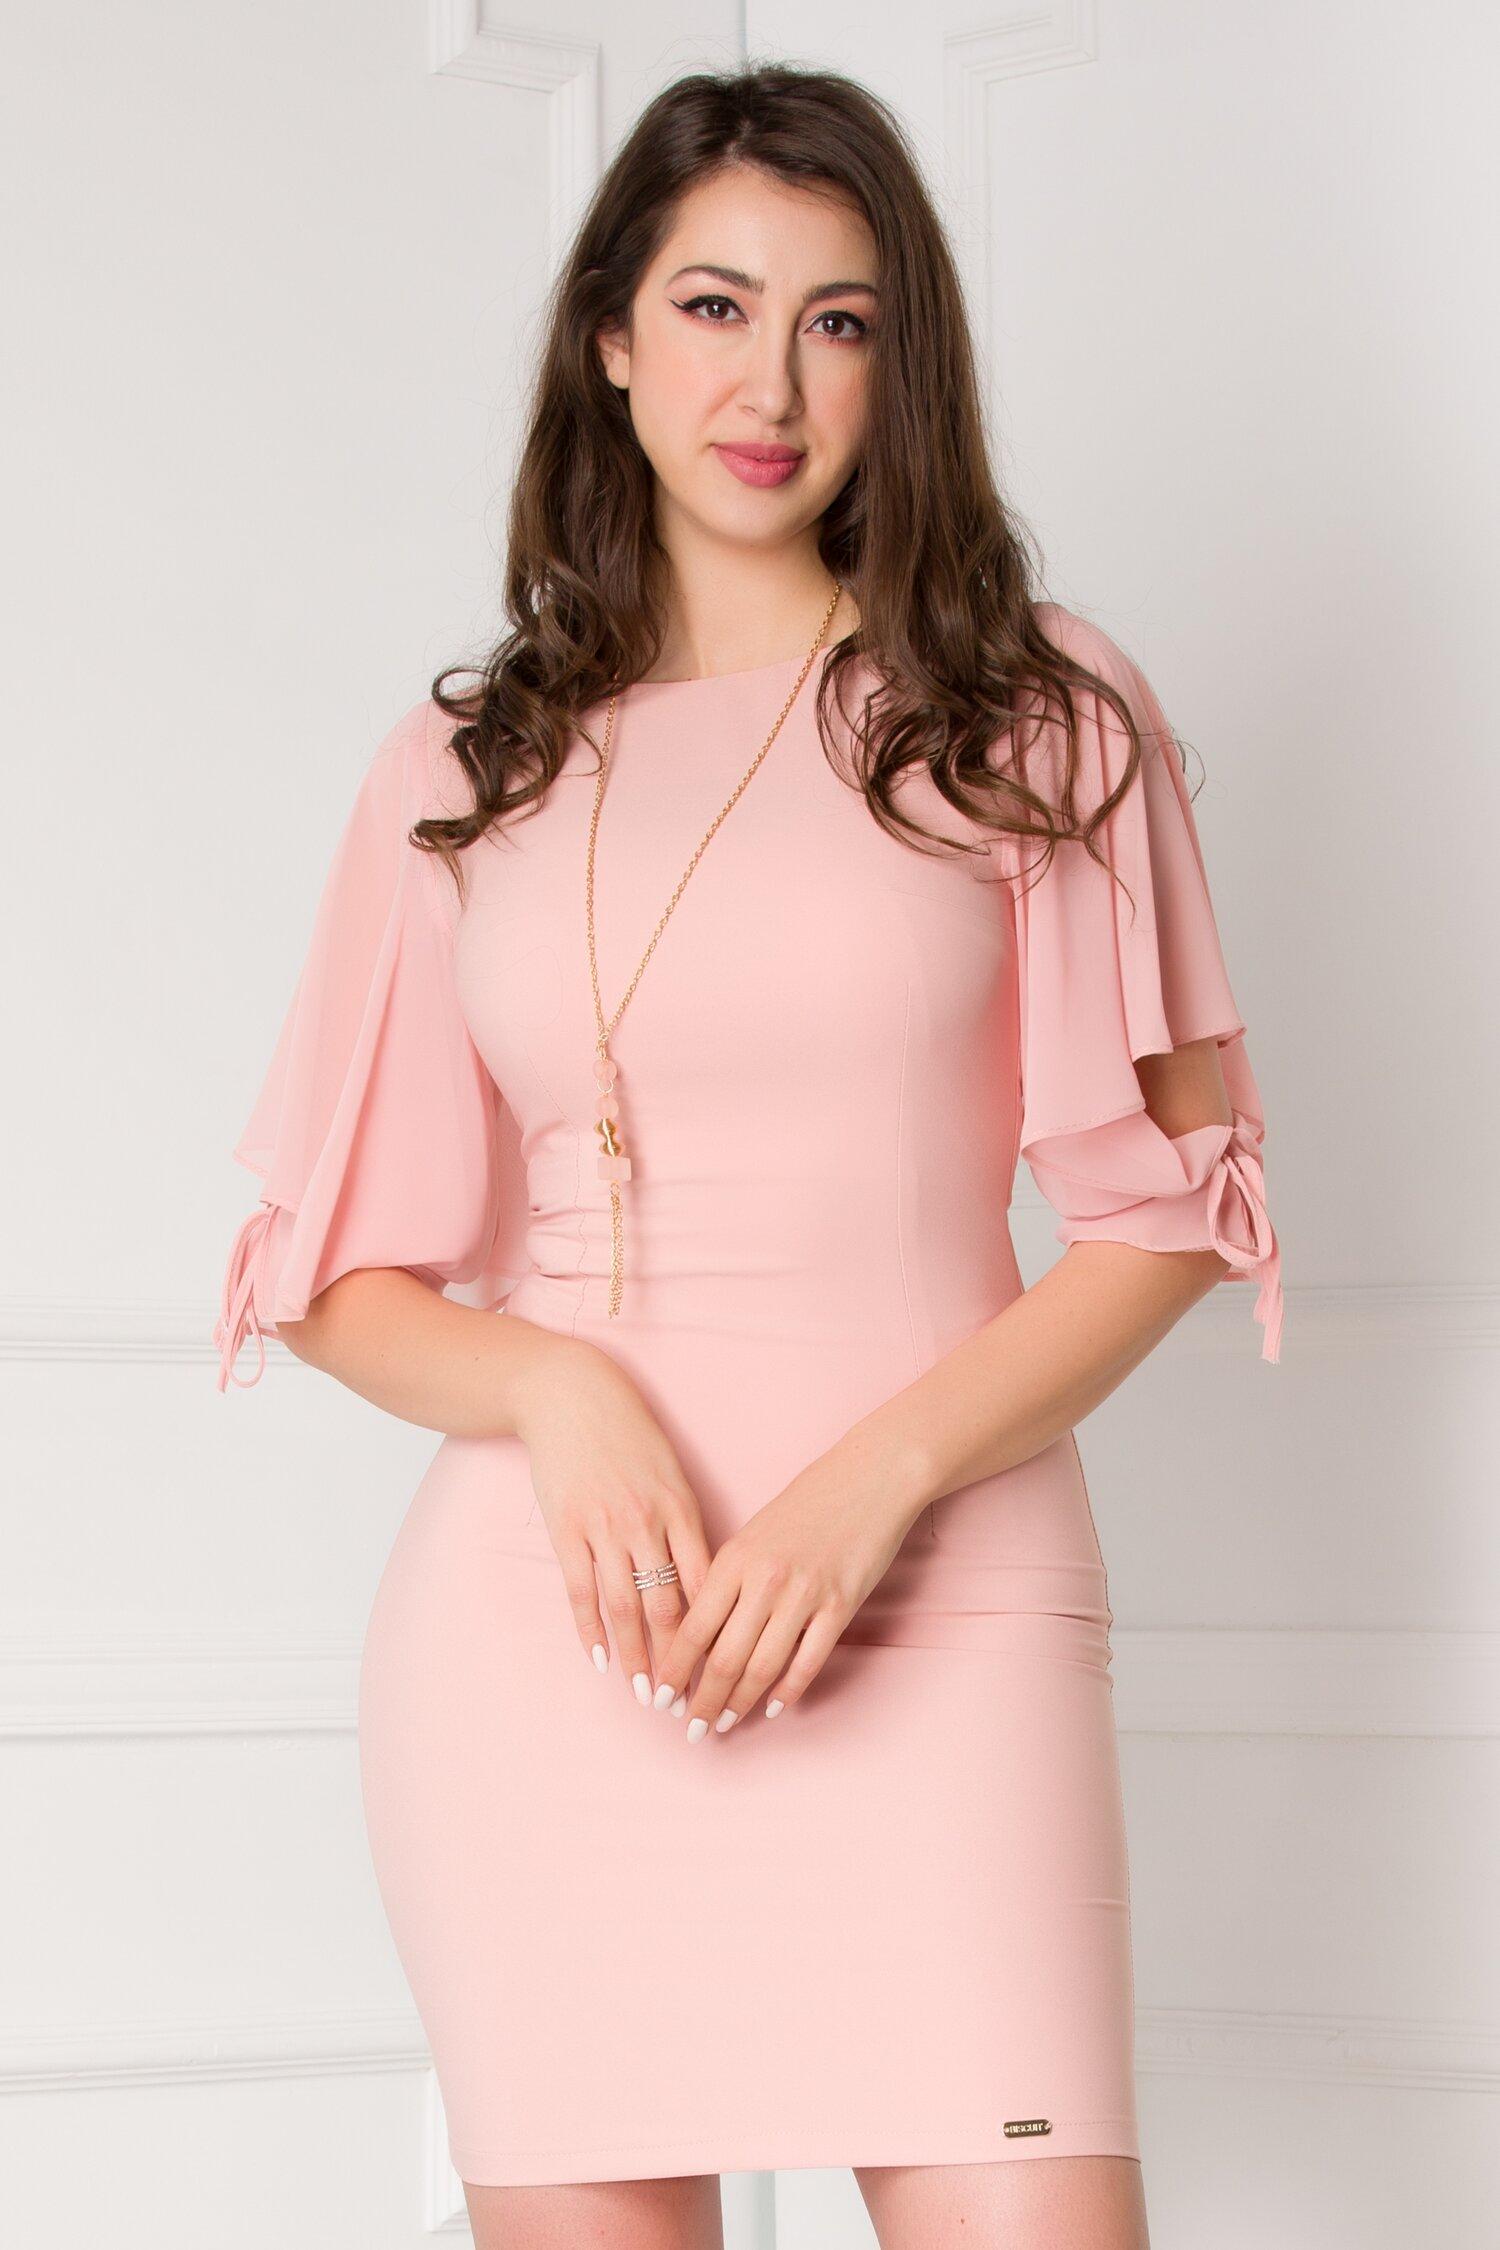 Rochie Ariana roz cu maneci vaporoase